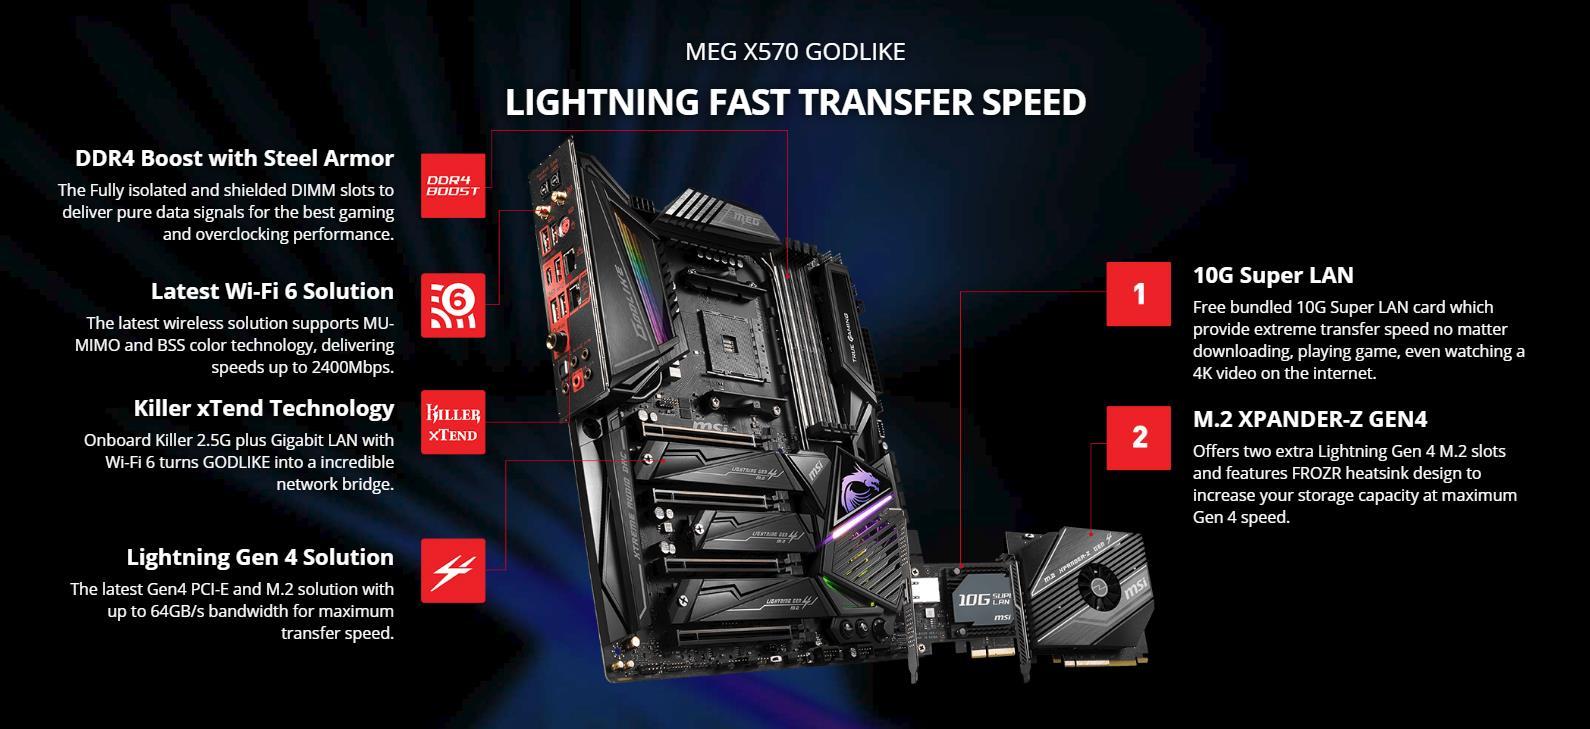 MSI MEG X570 GODLIKE AMD AM4 X570 E-ATX Gaming Motherboard